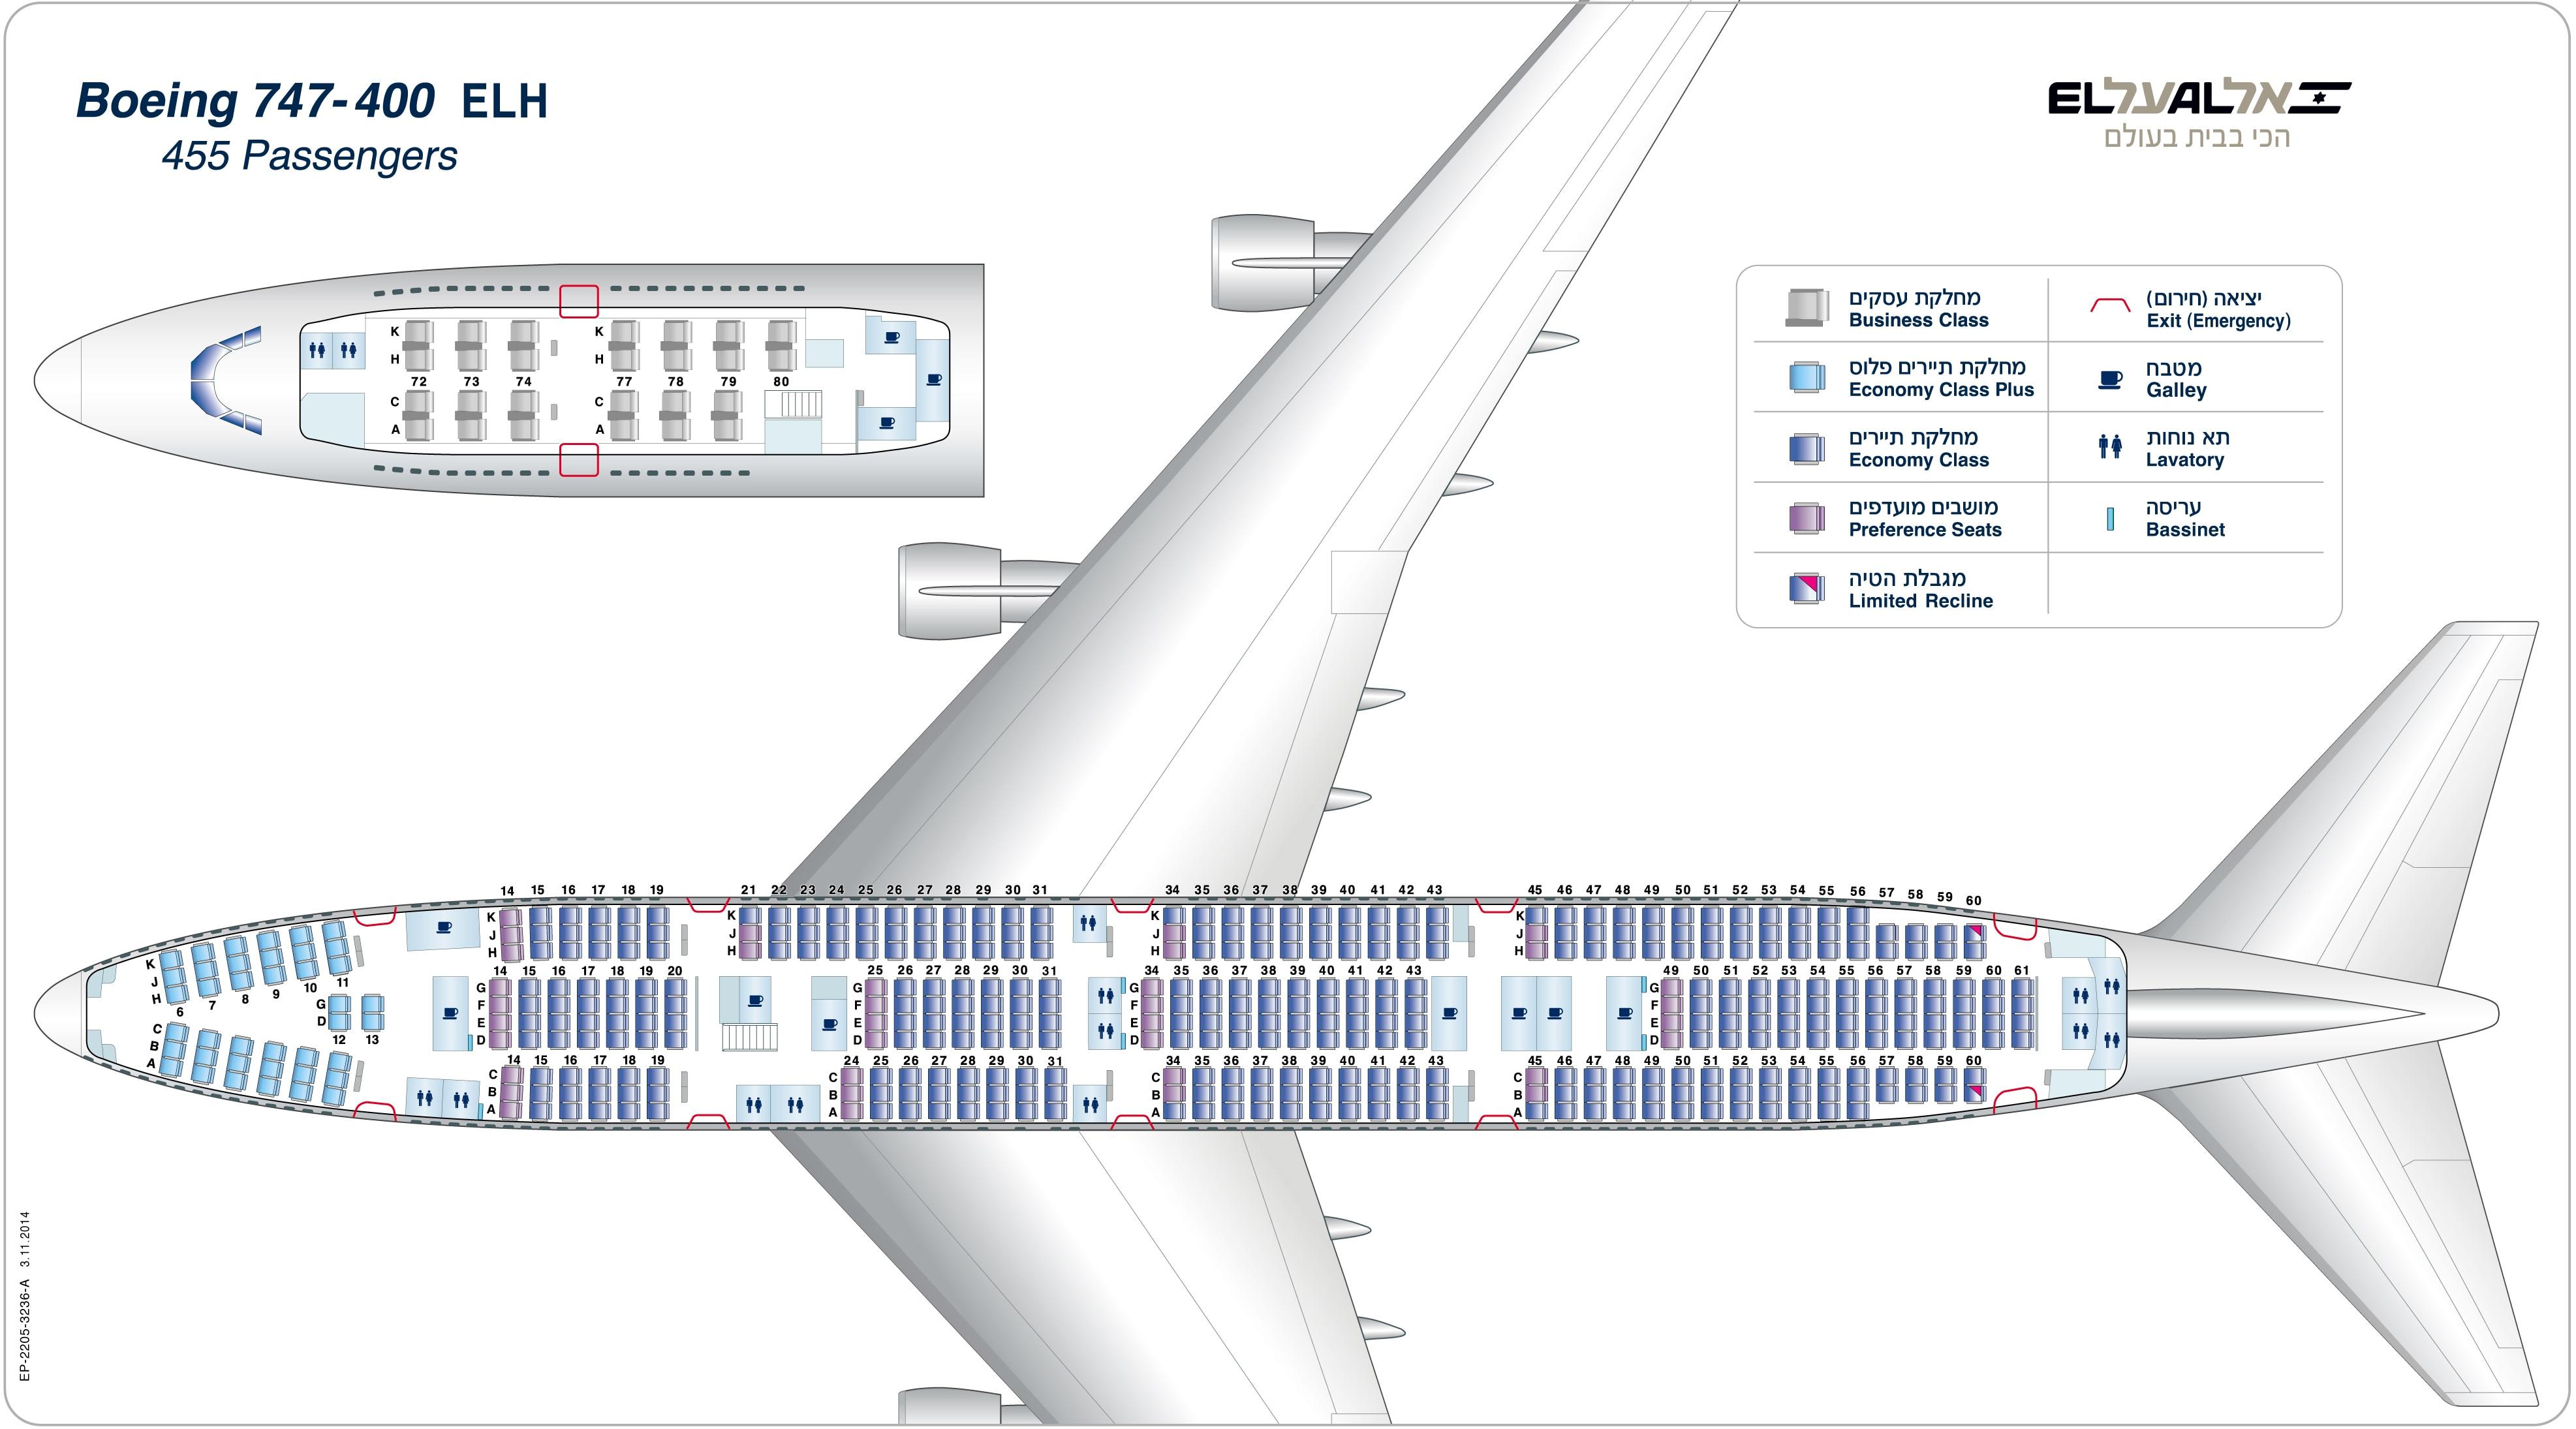 Boeing 747 400 ele boeing 747 400 elh boeing 747 400 ela b c d for Plan de cabine boeing 747 400 corsair